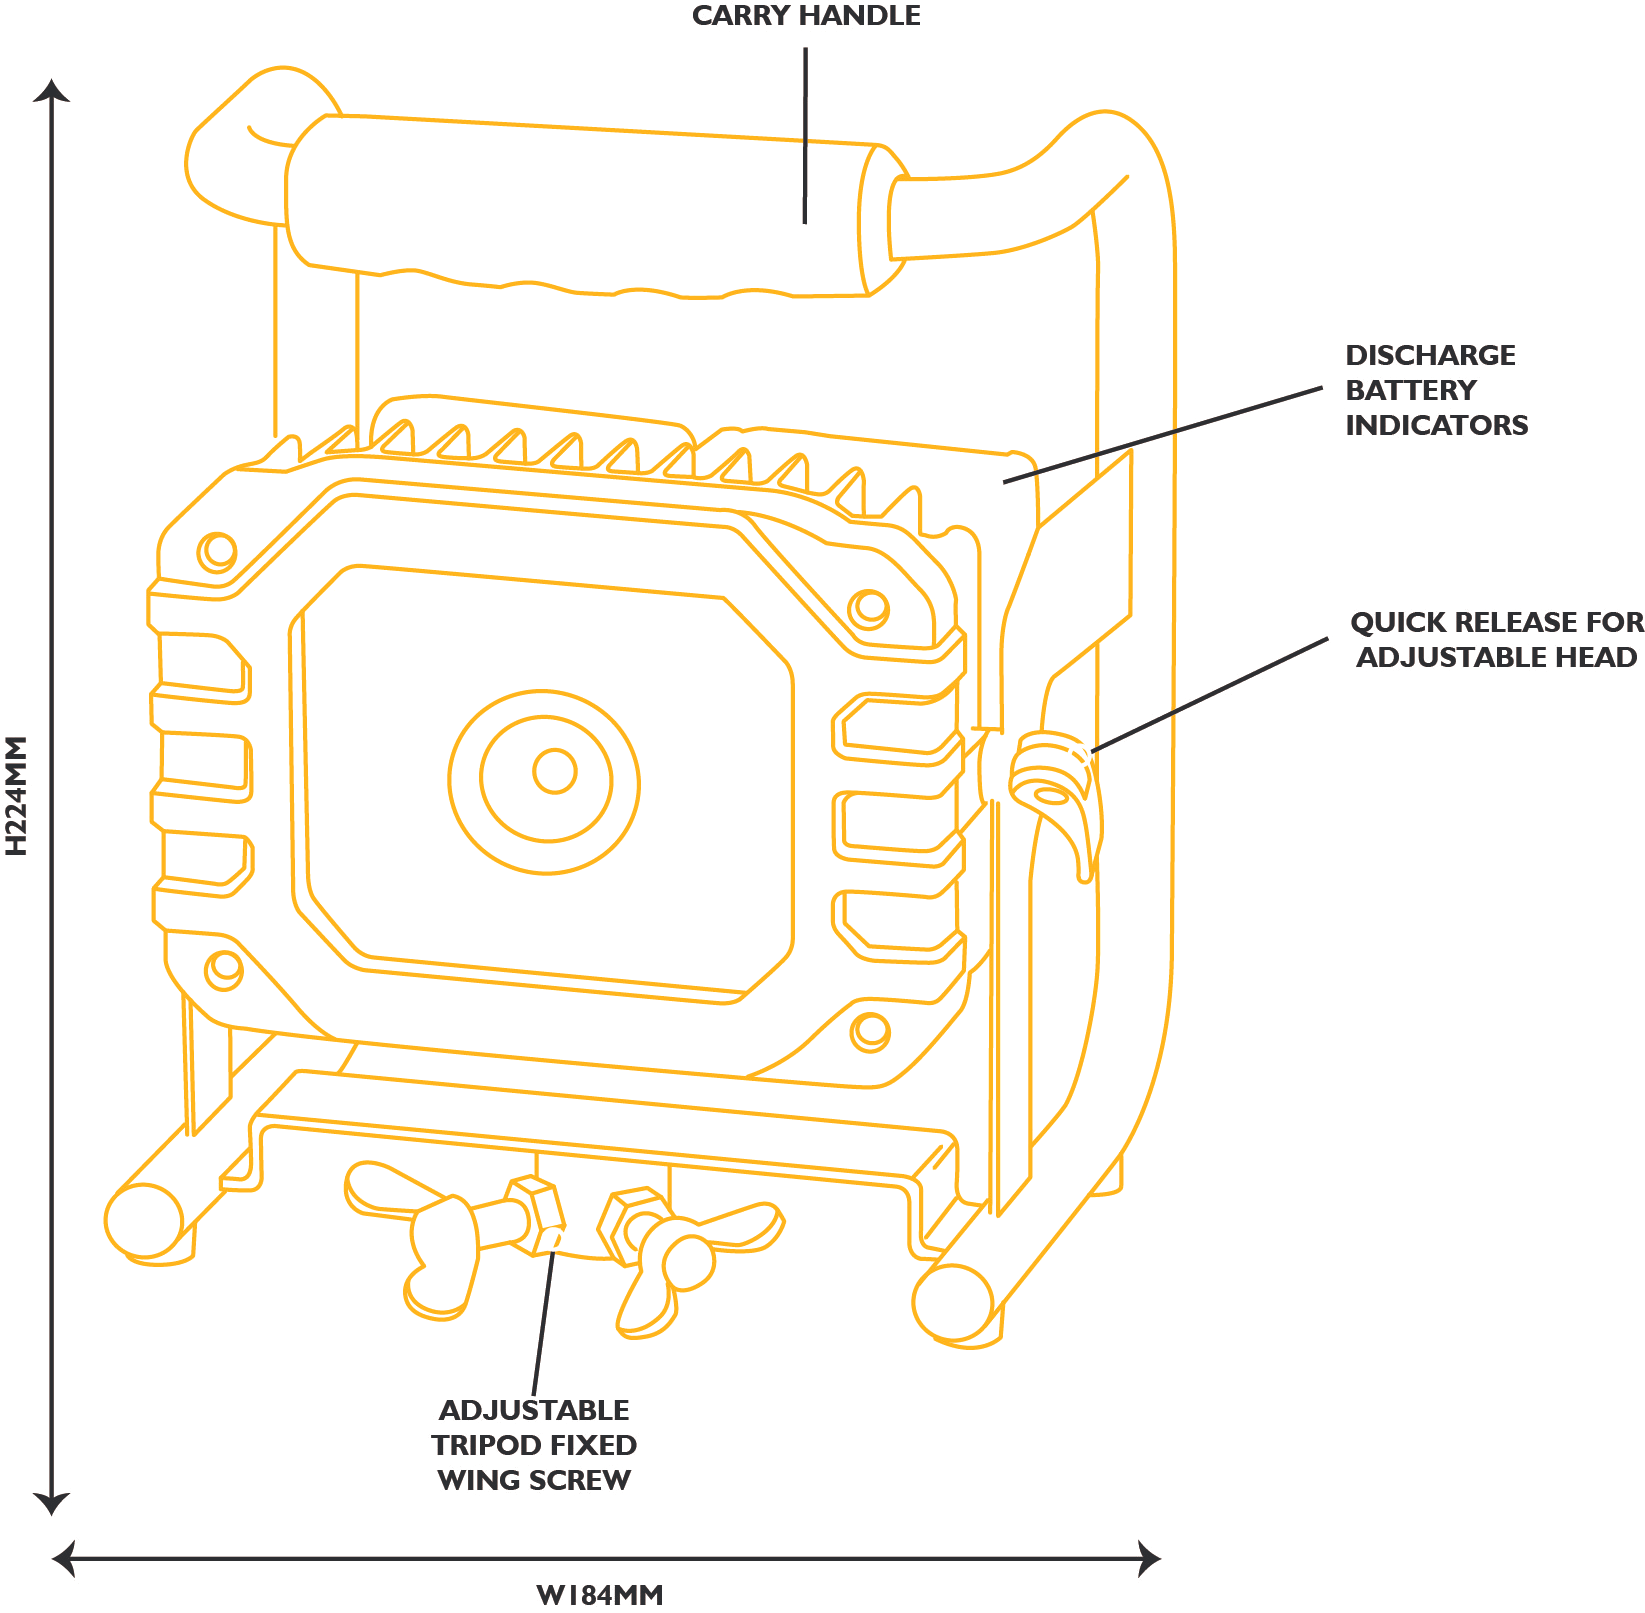 10W LED Rechargeable Power Light (2x 7.4V Batteries) [diagram]